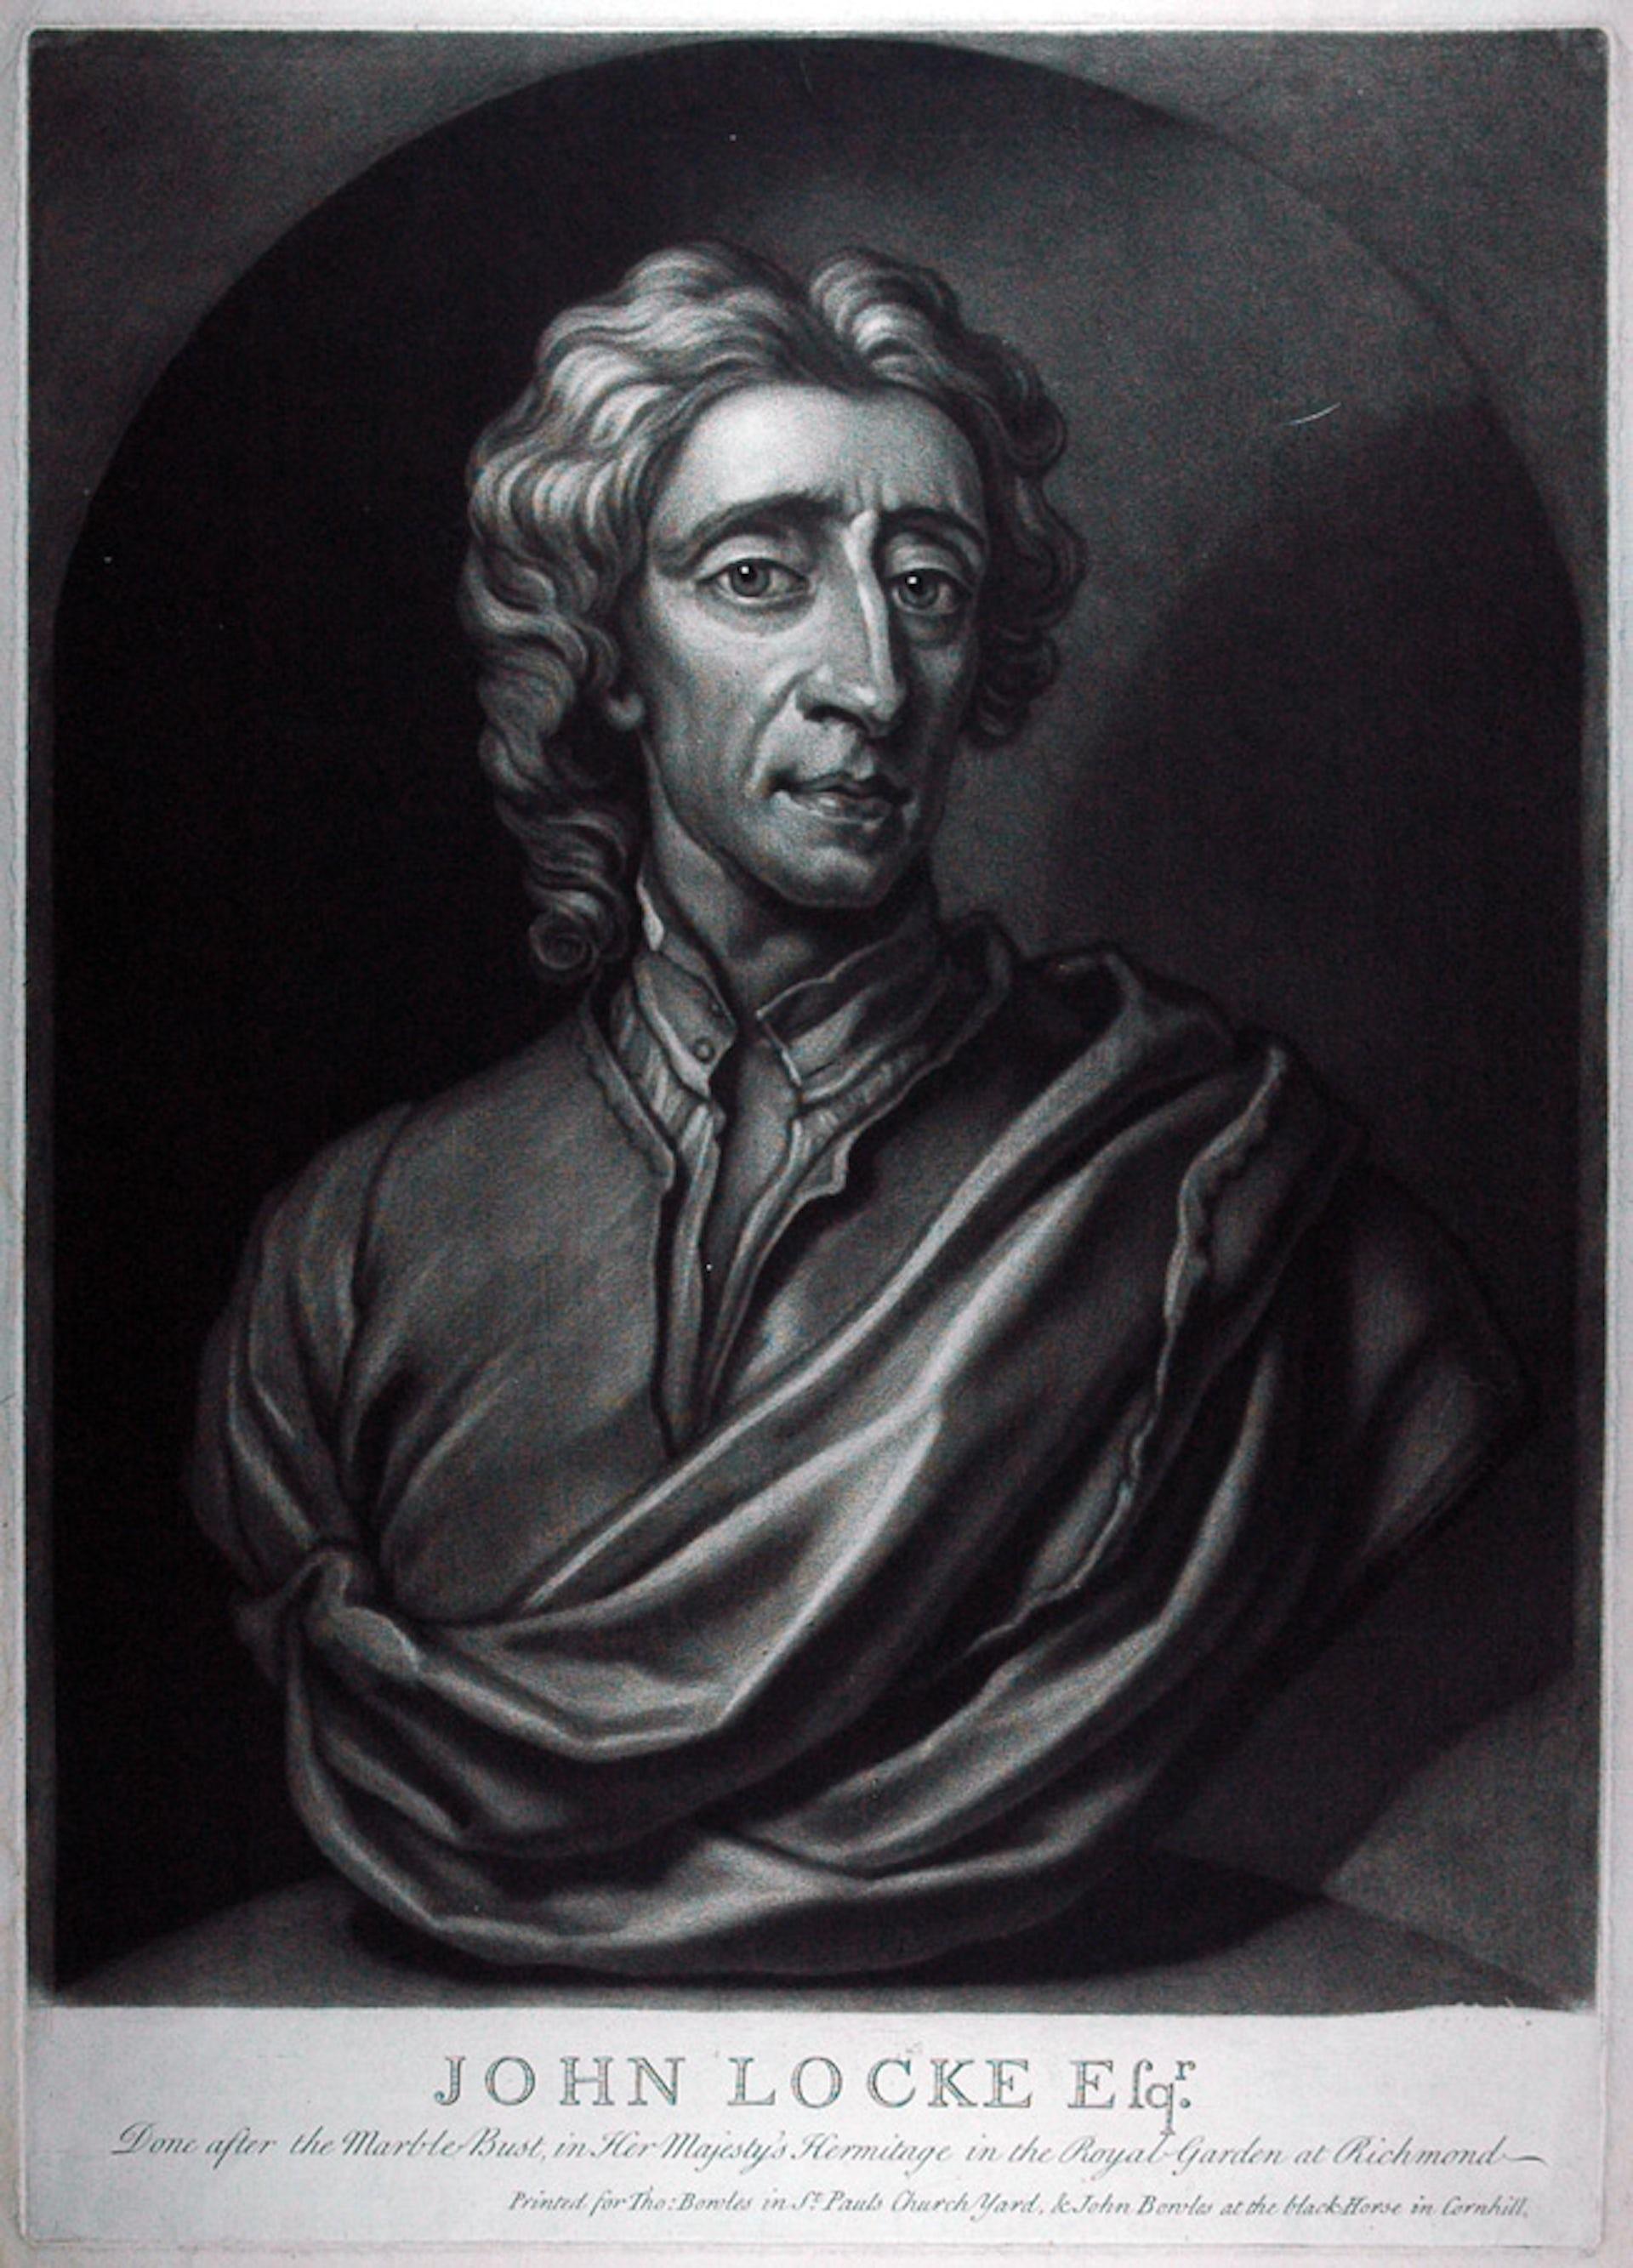 John Locke & Ralph Northam: Should We Judge People for Their Past Moral Failings?